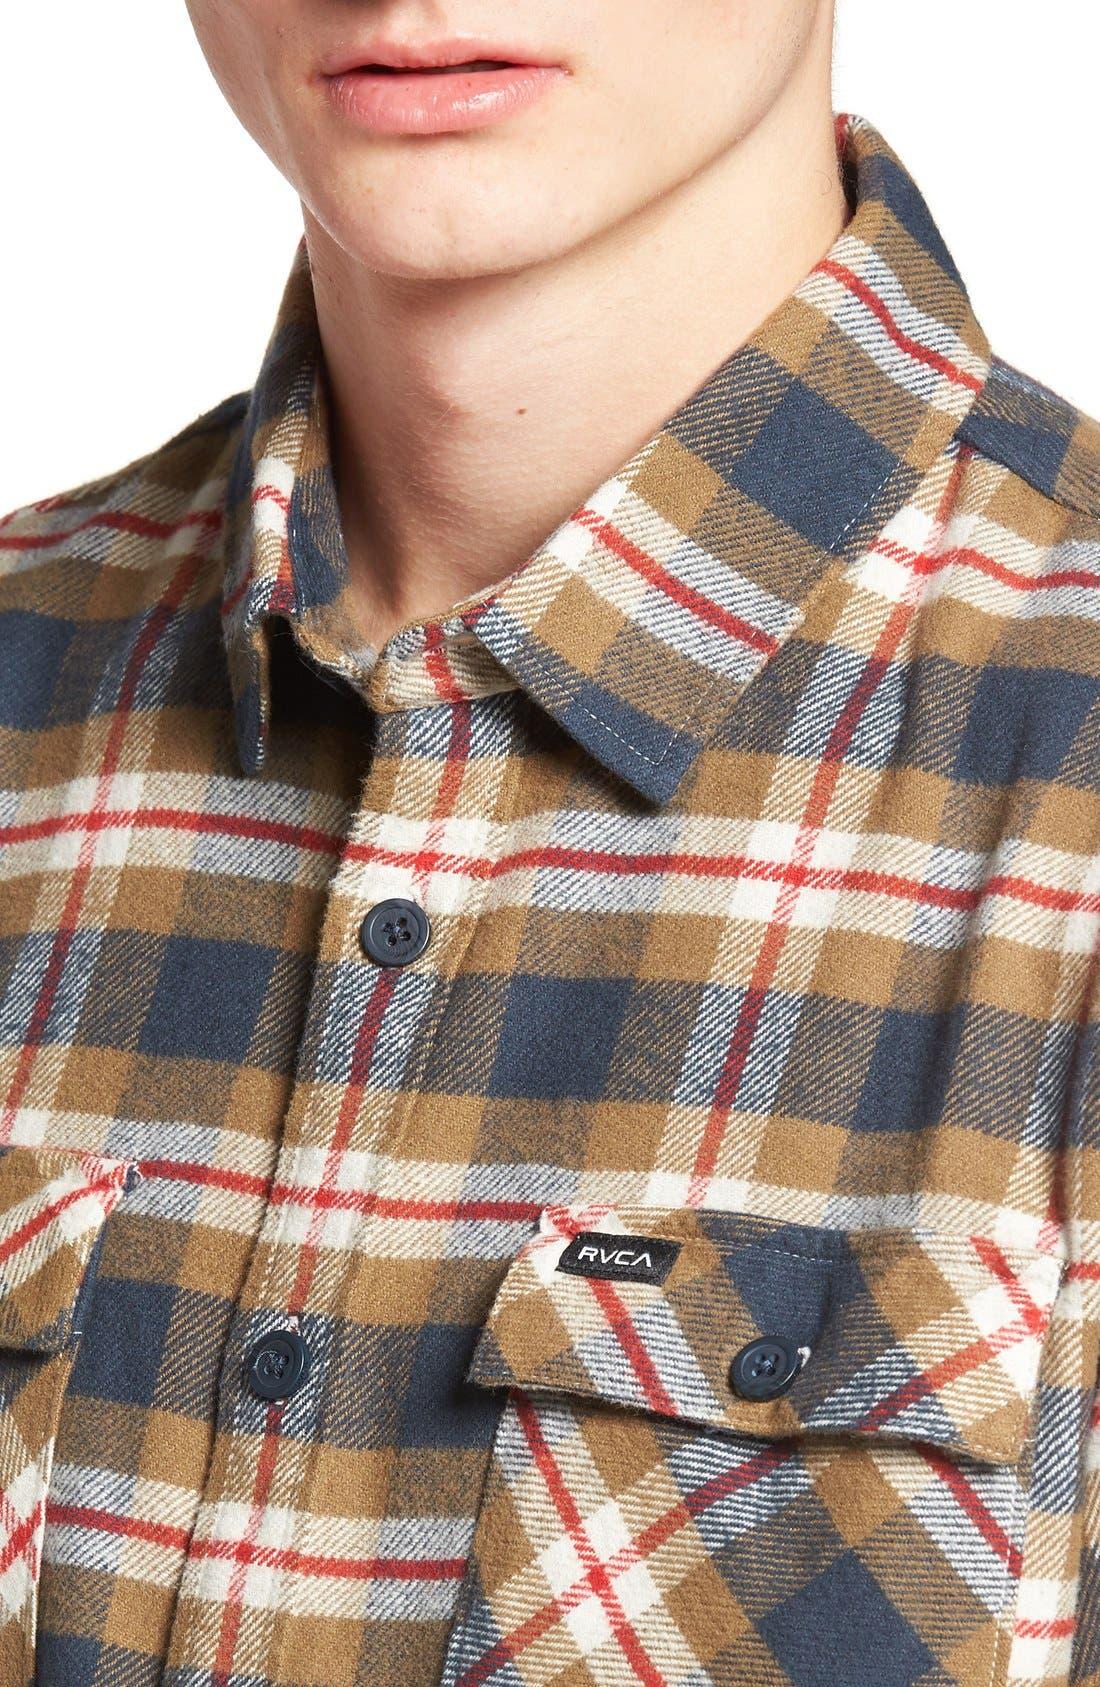 'That'll Work' Trim Fit Plaid Flannel Shirt,                             Alternate thumbnail 11, color,